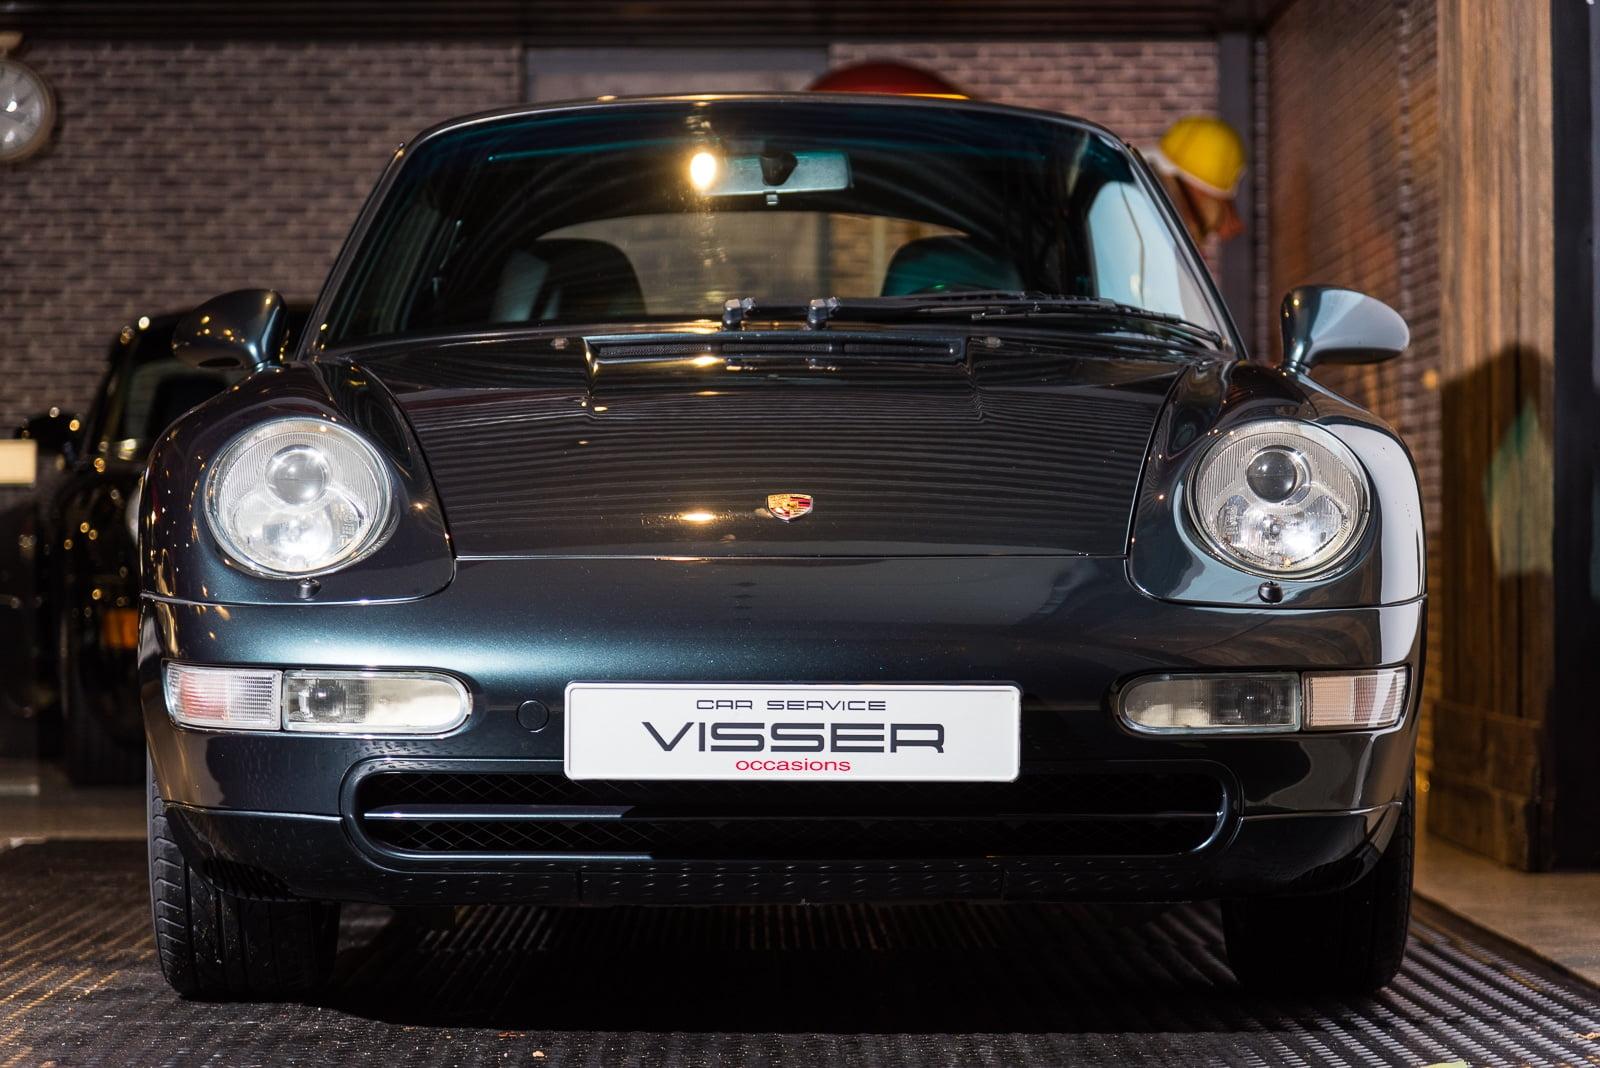 Porsche 993 Carrera 2 Cabrio Tiptronic S